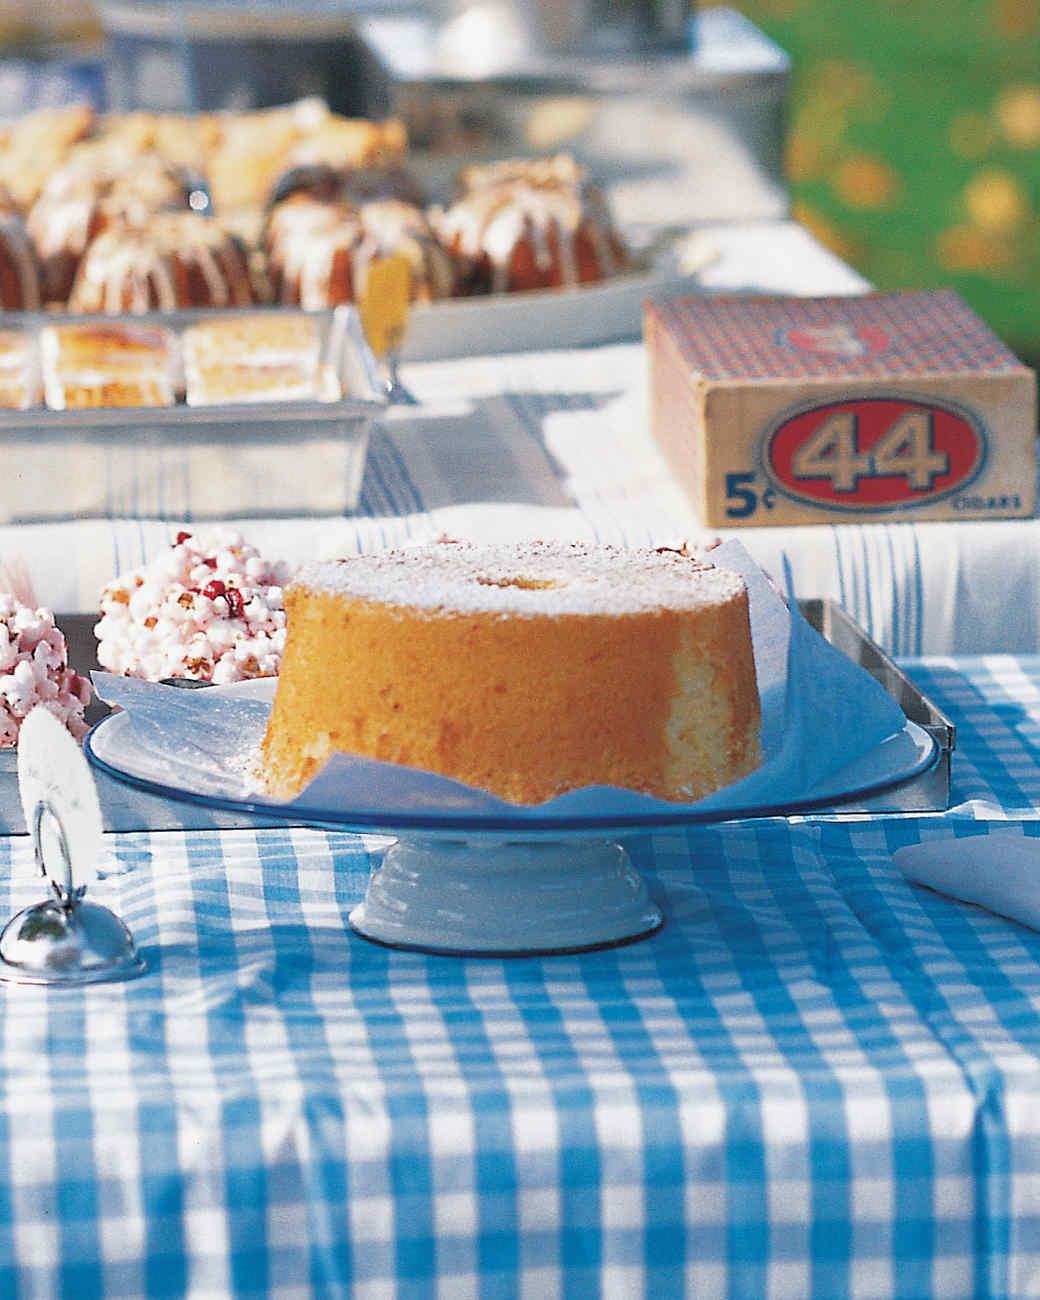 cakes_00149_t.jpg